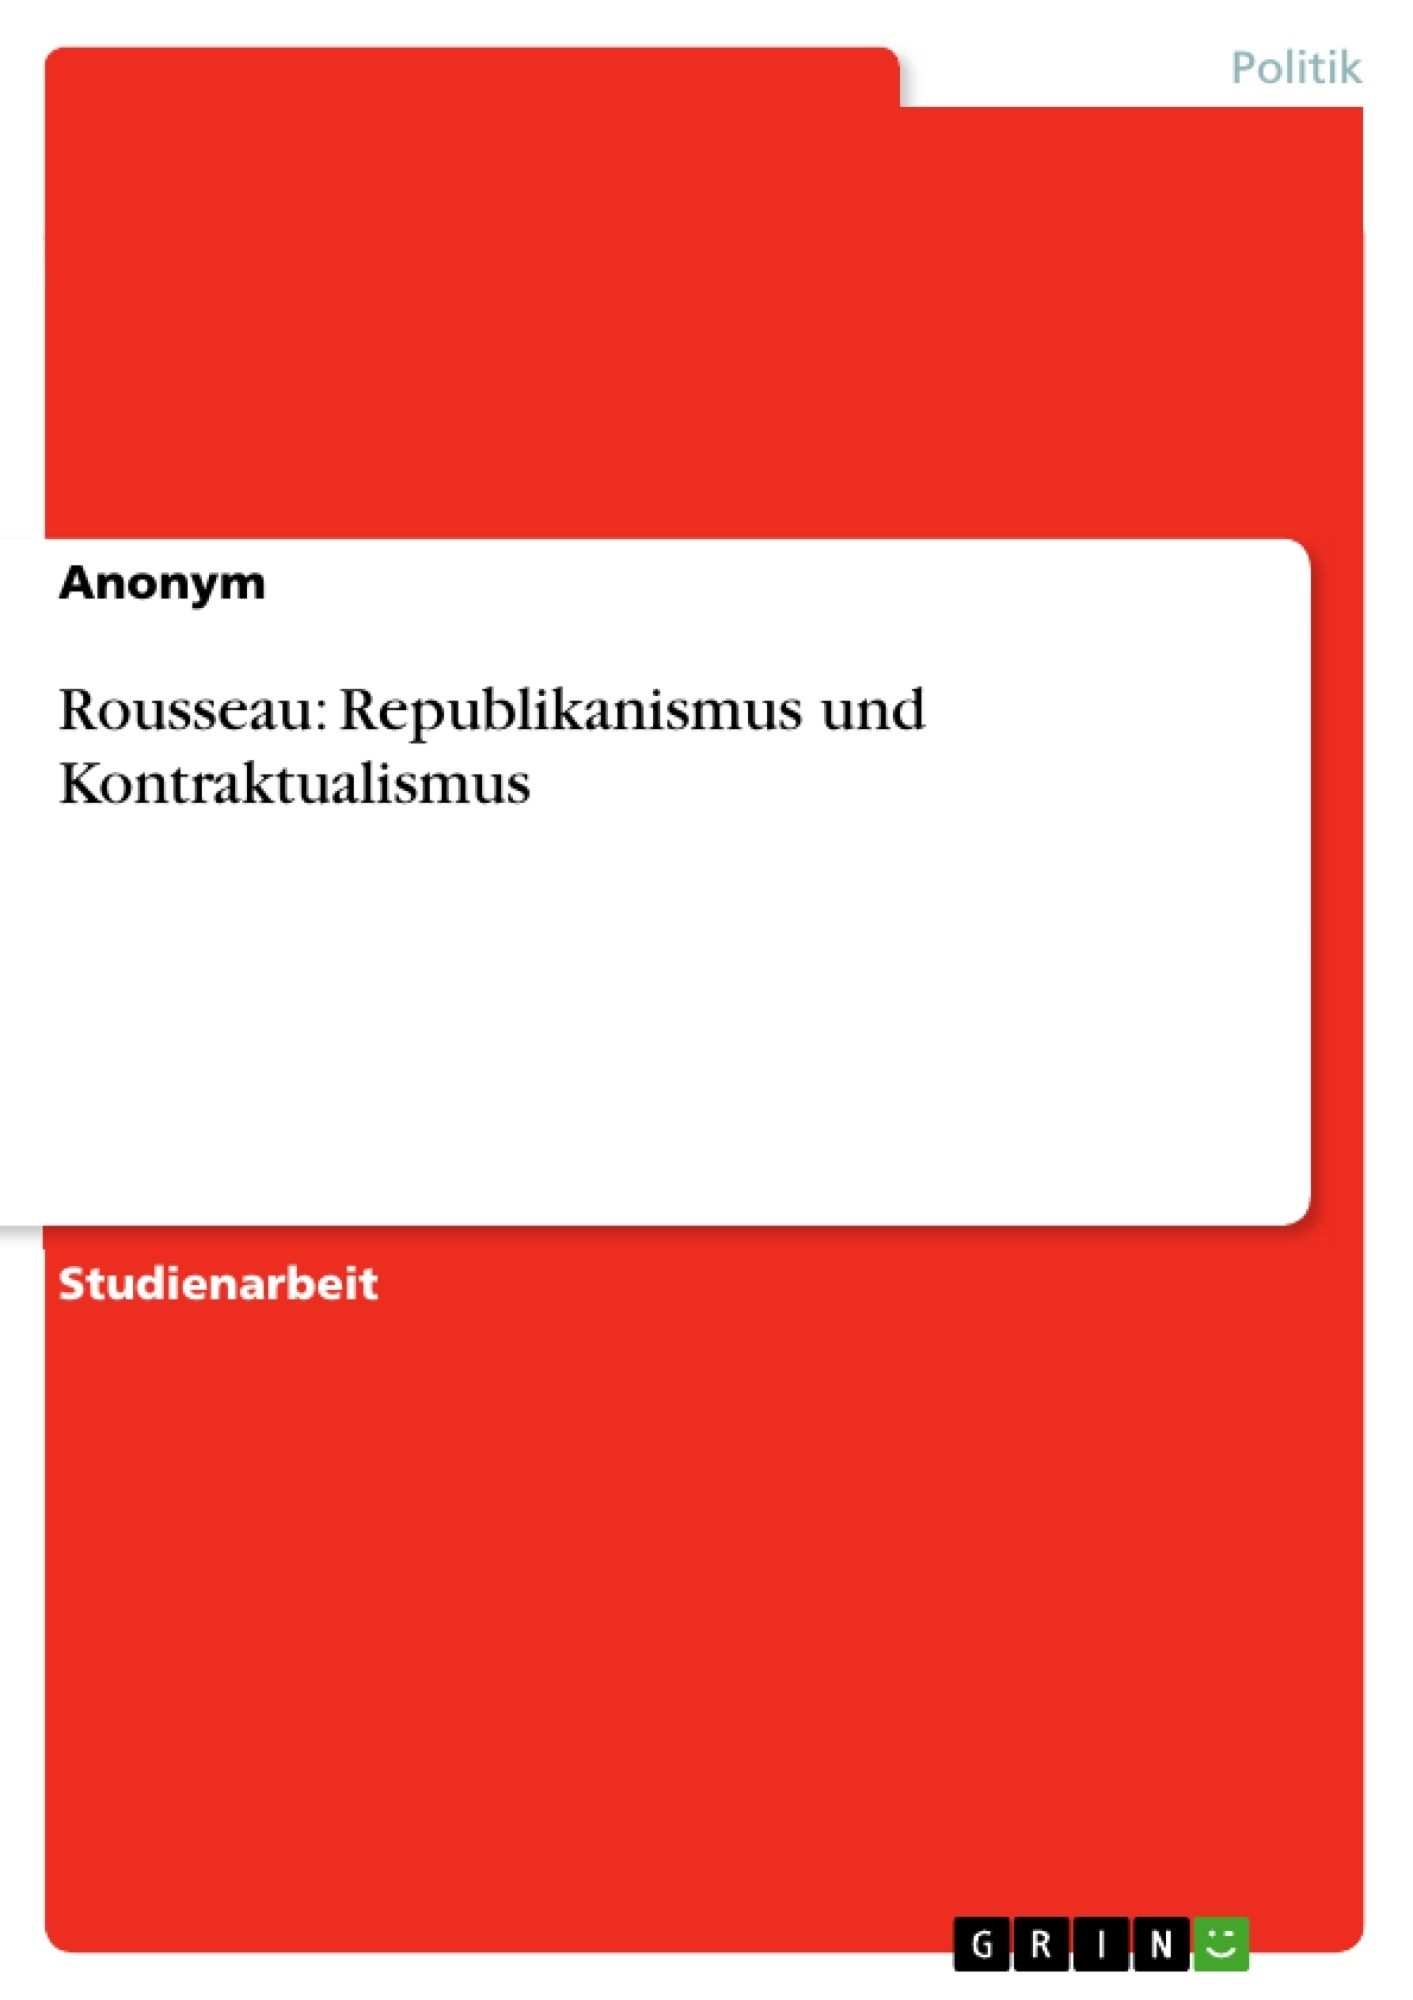 Titel: Rousseau: Republikanismus und Kontraktualismus